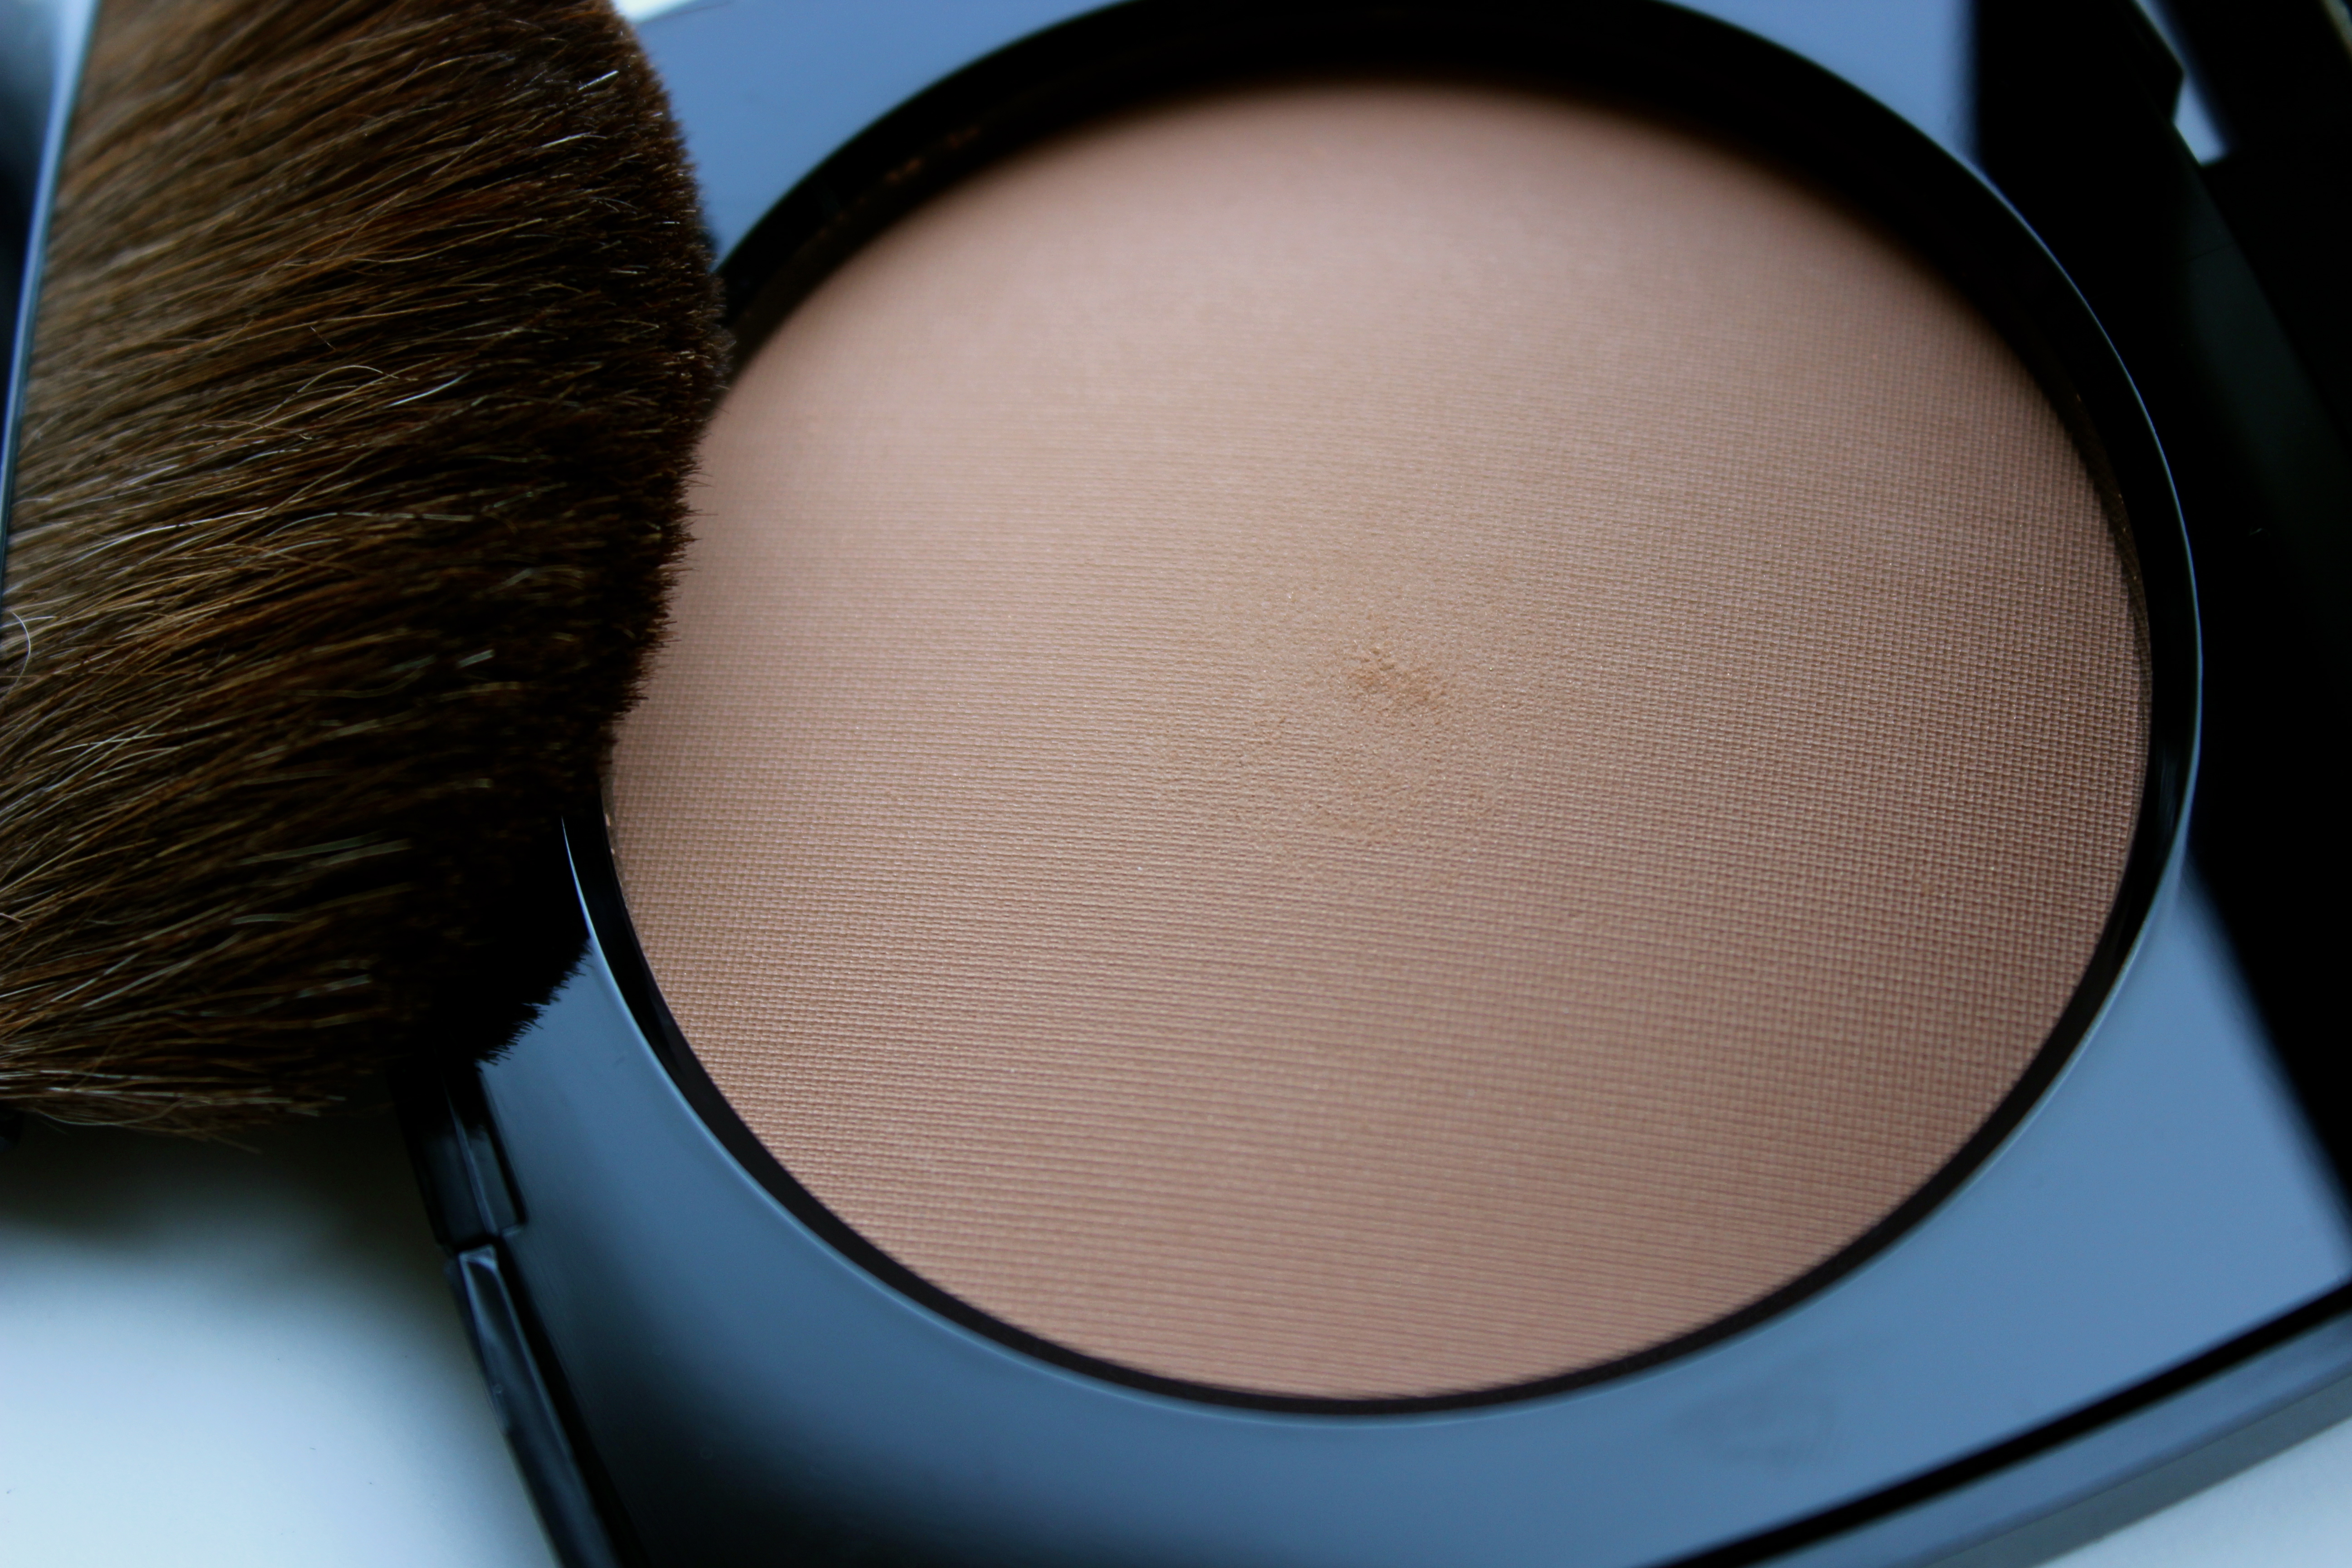 3d32c53f Chanel Les Beiges Healthy Glow Sheer Powder in N*30